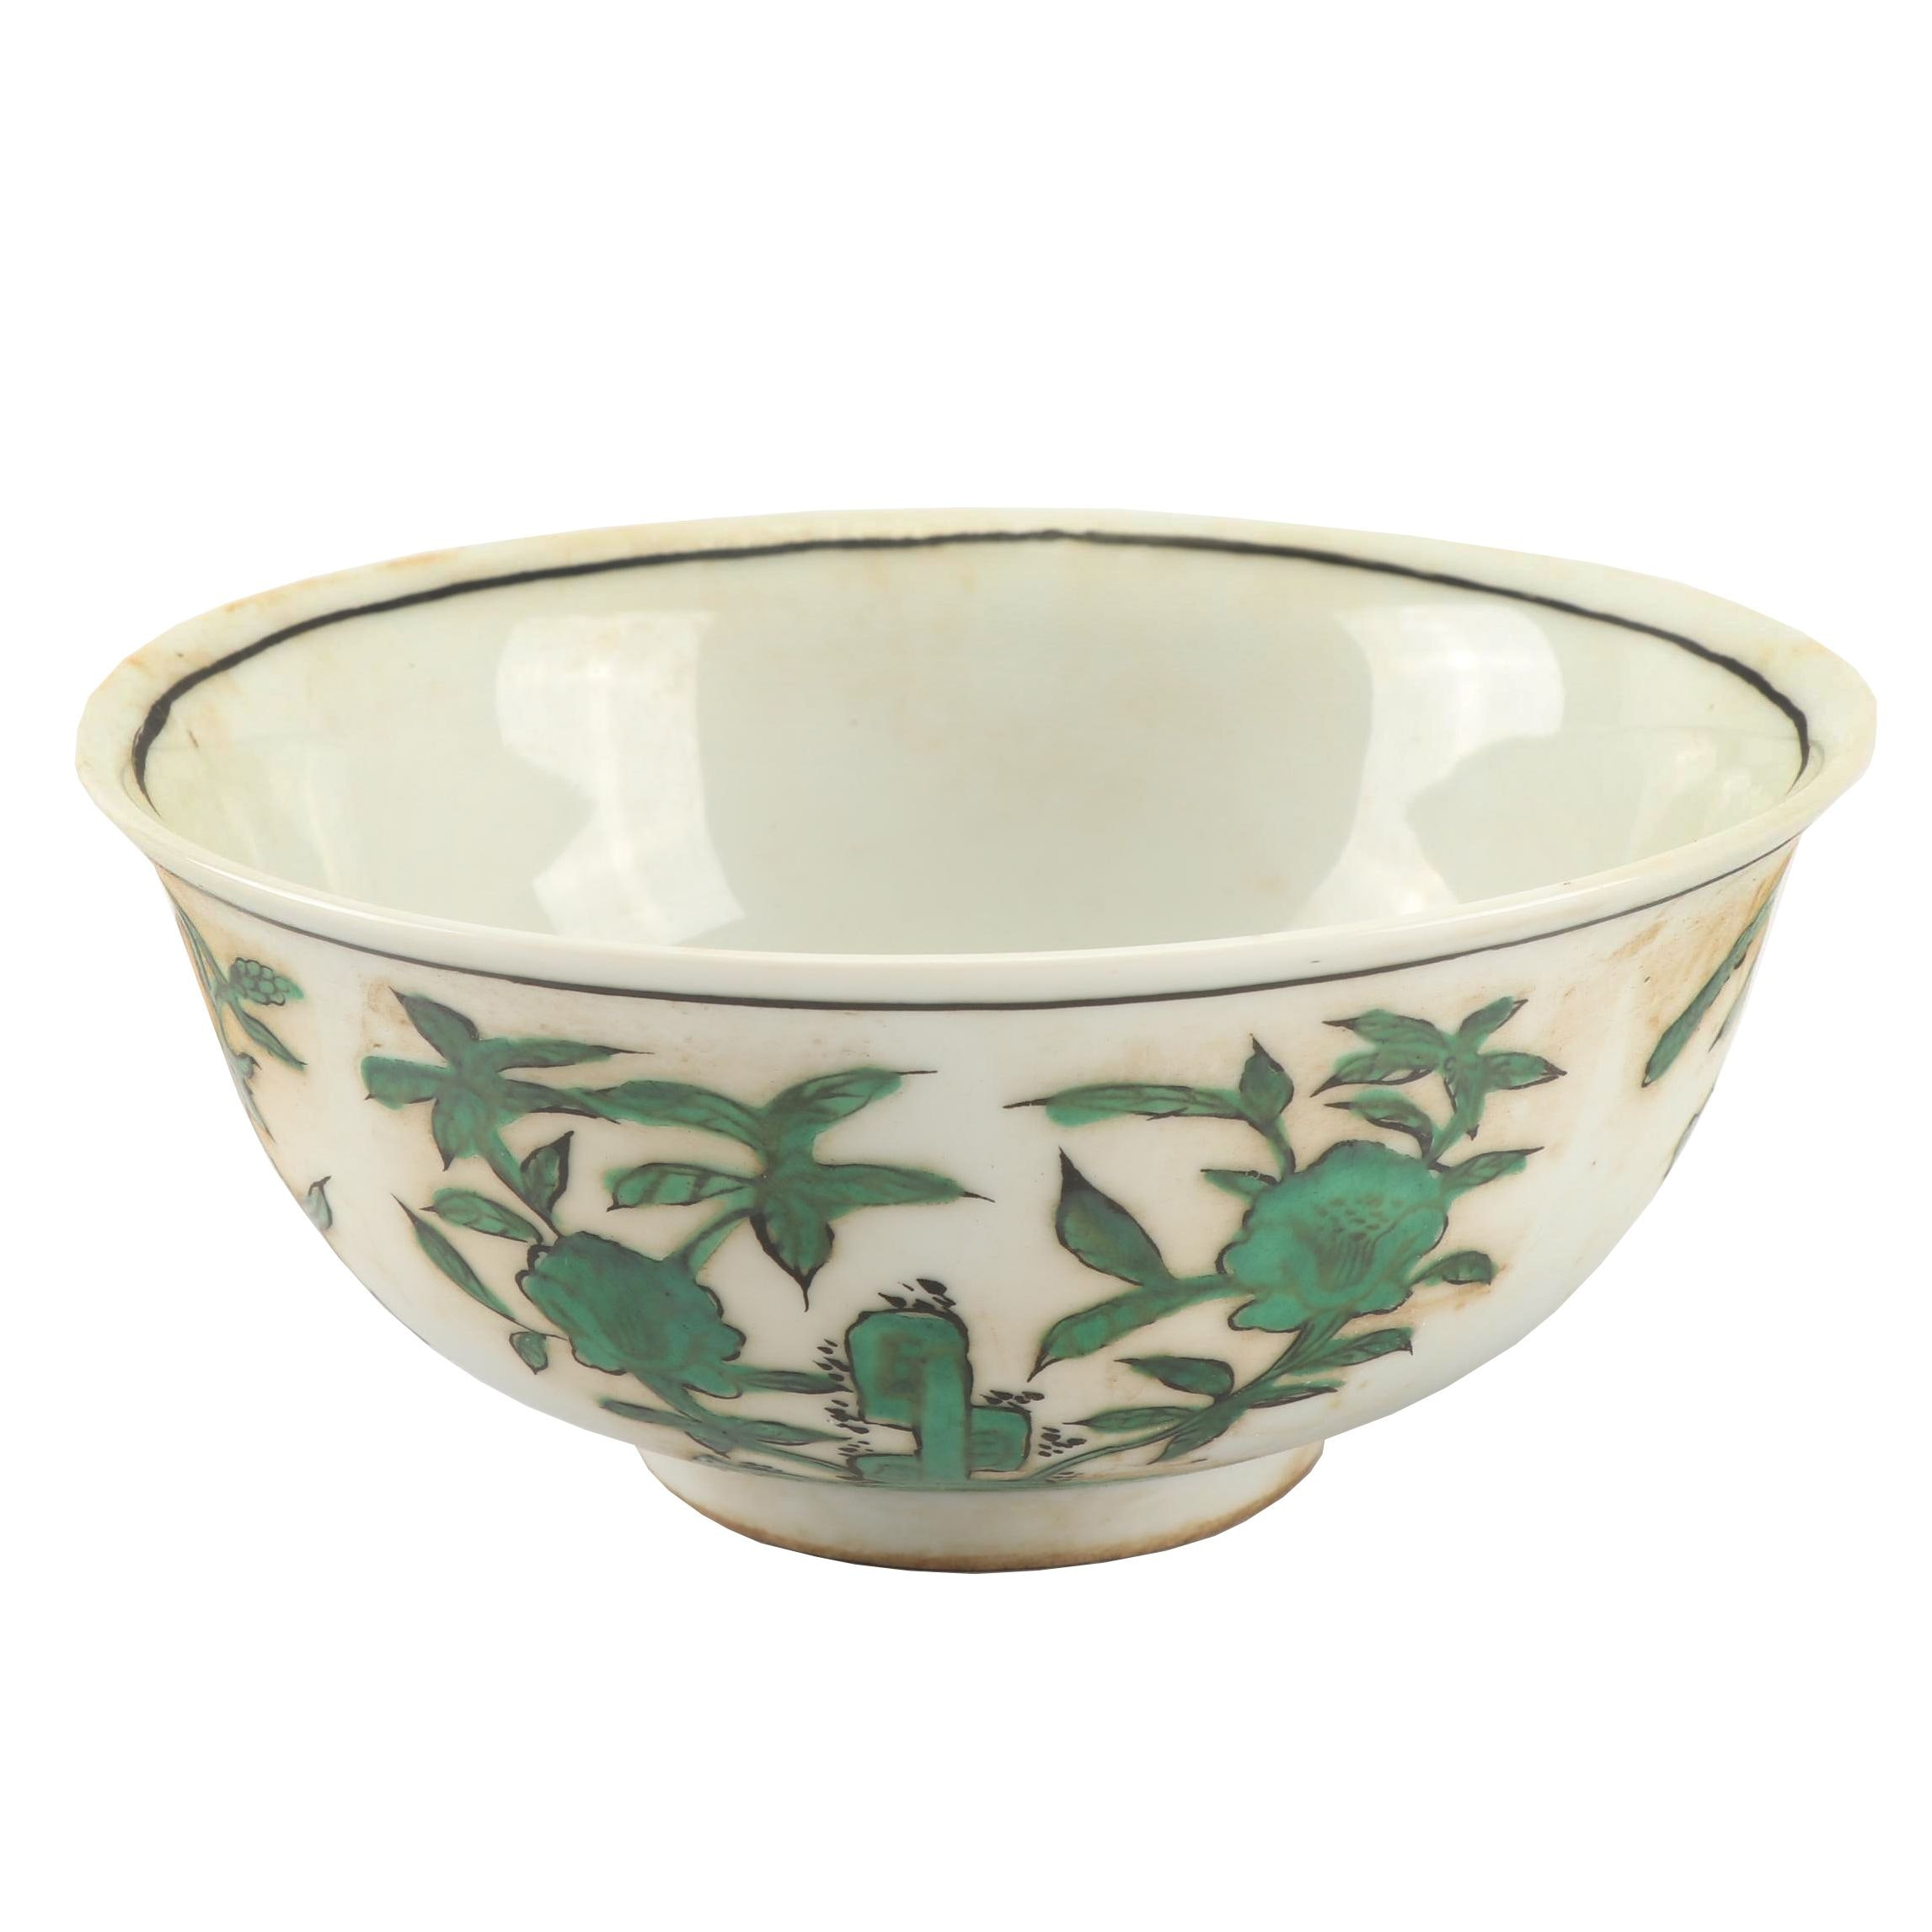 Chinese Hand-Embellished Porcelain Bowl